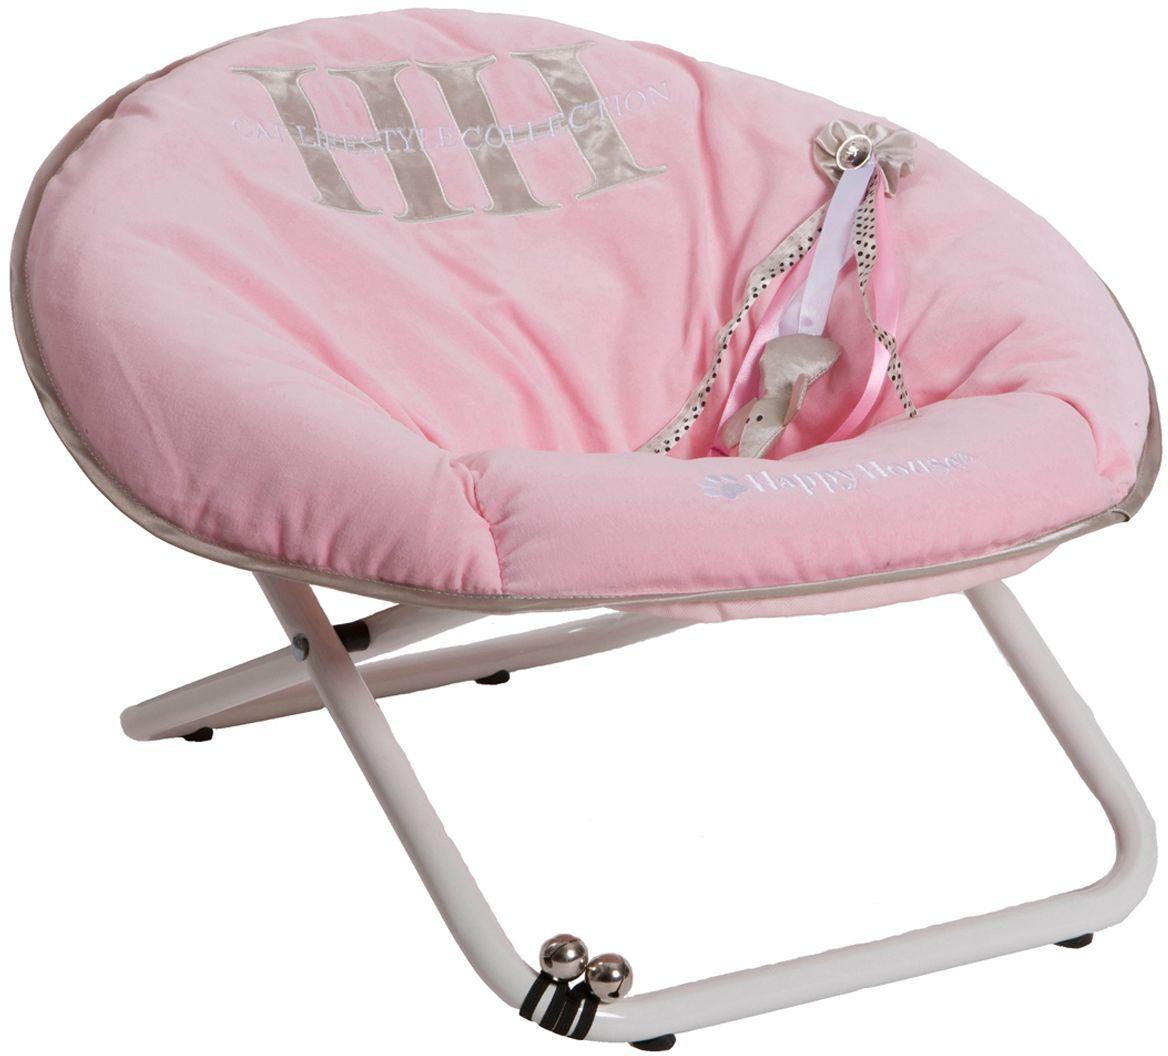 Стул для кошек Happy House Cat Lifestyle, цвет: розовый, 55х51х36 см, до 15 кг8308-1